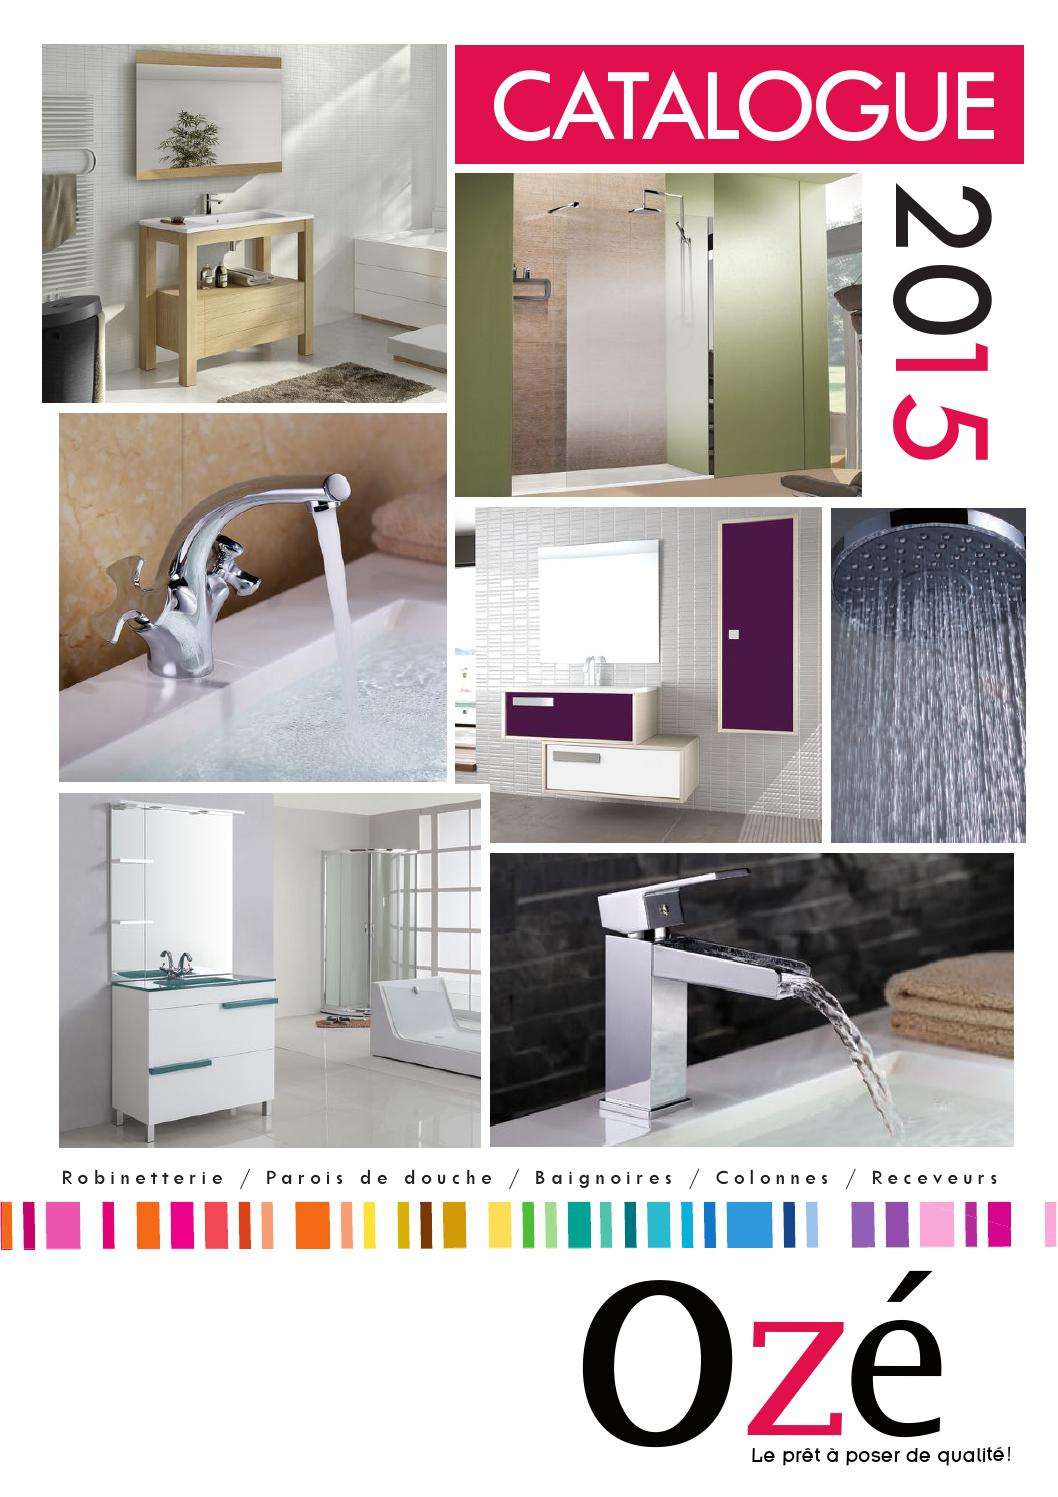 Connu Catalogue oze 2015 bd mufraggi materiaux copie by GENESE - issuu KU37